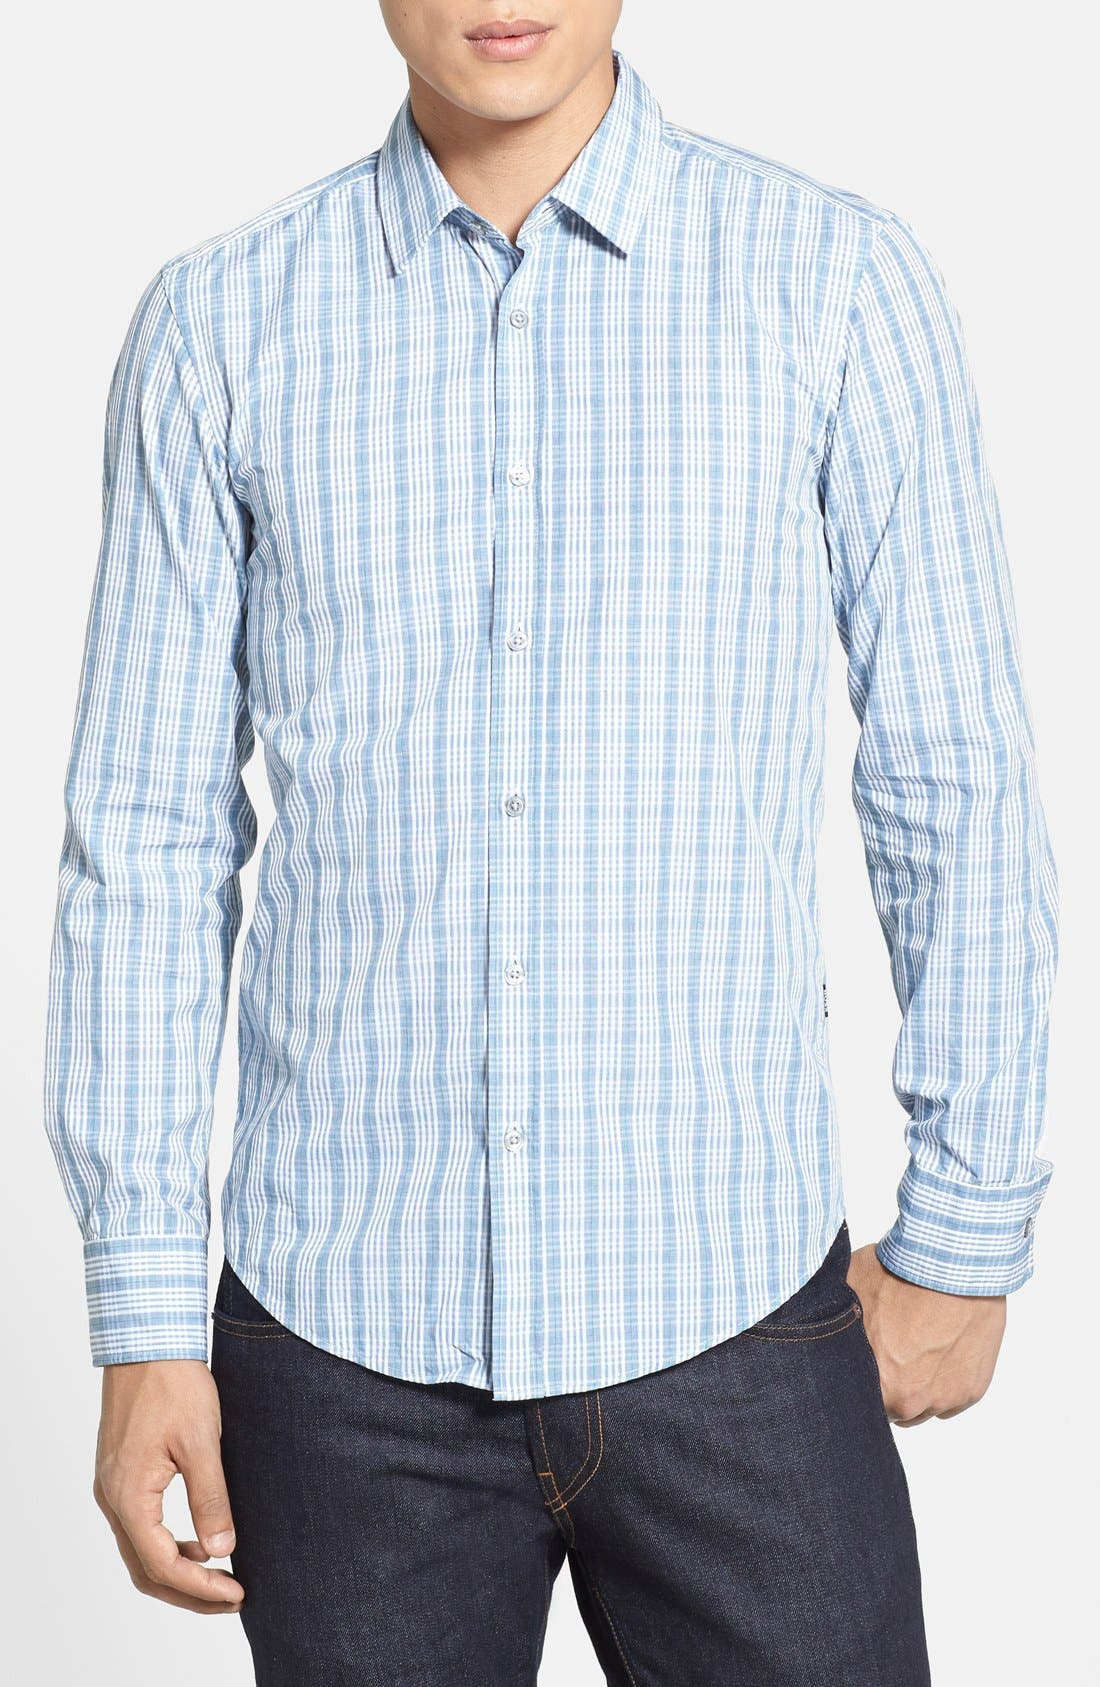 Main Image - BOSS HUGO BOSS 'Ronny' Slim Fit Plaid Sport Shirt